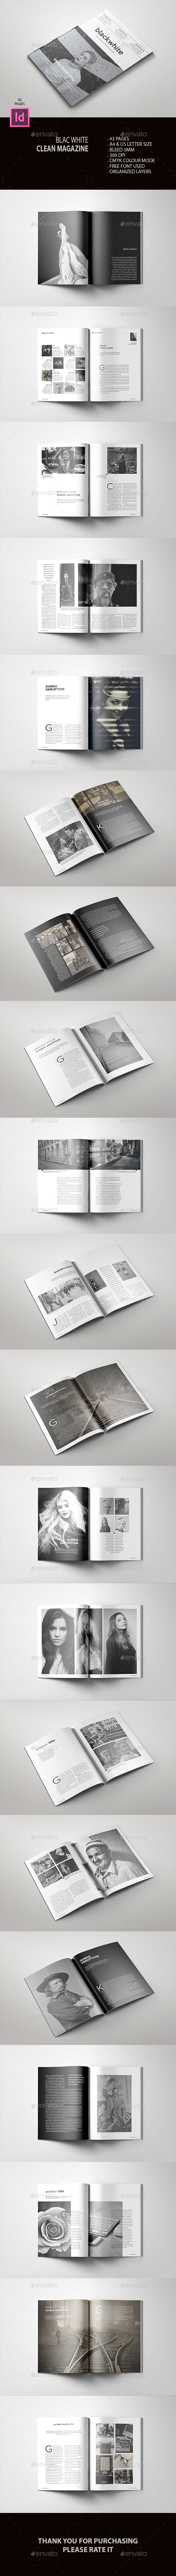 Black White Clean Magazine - Magazines Print Templates